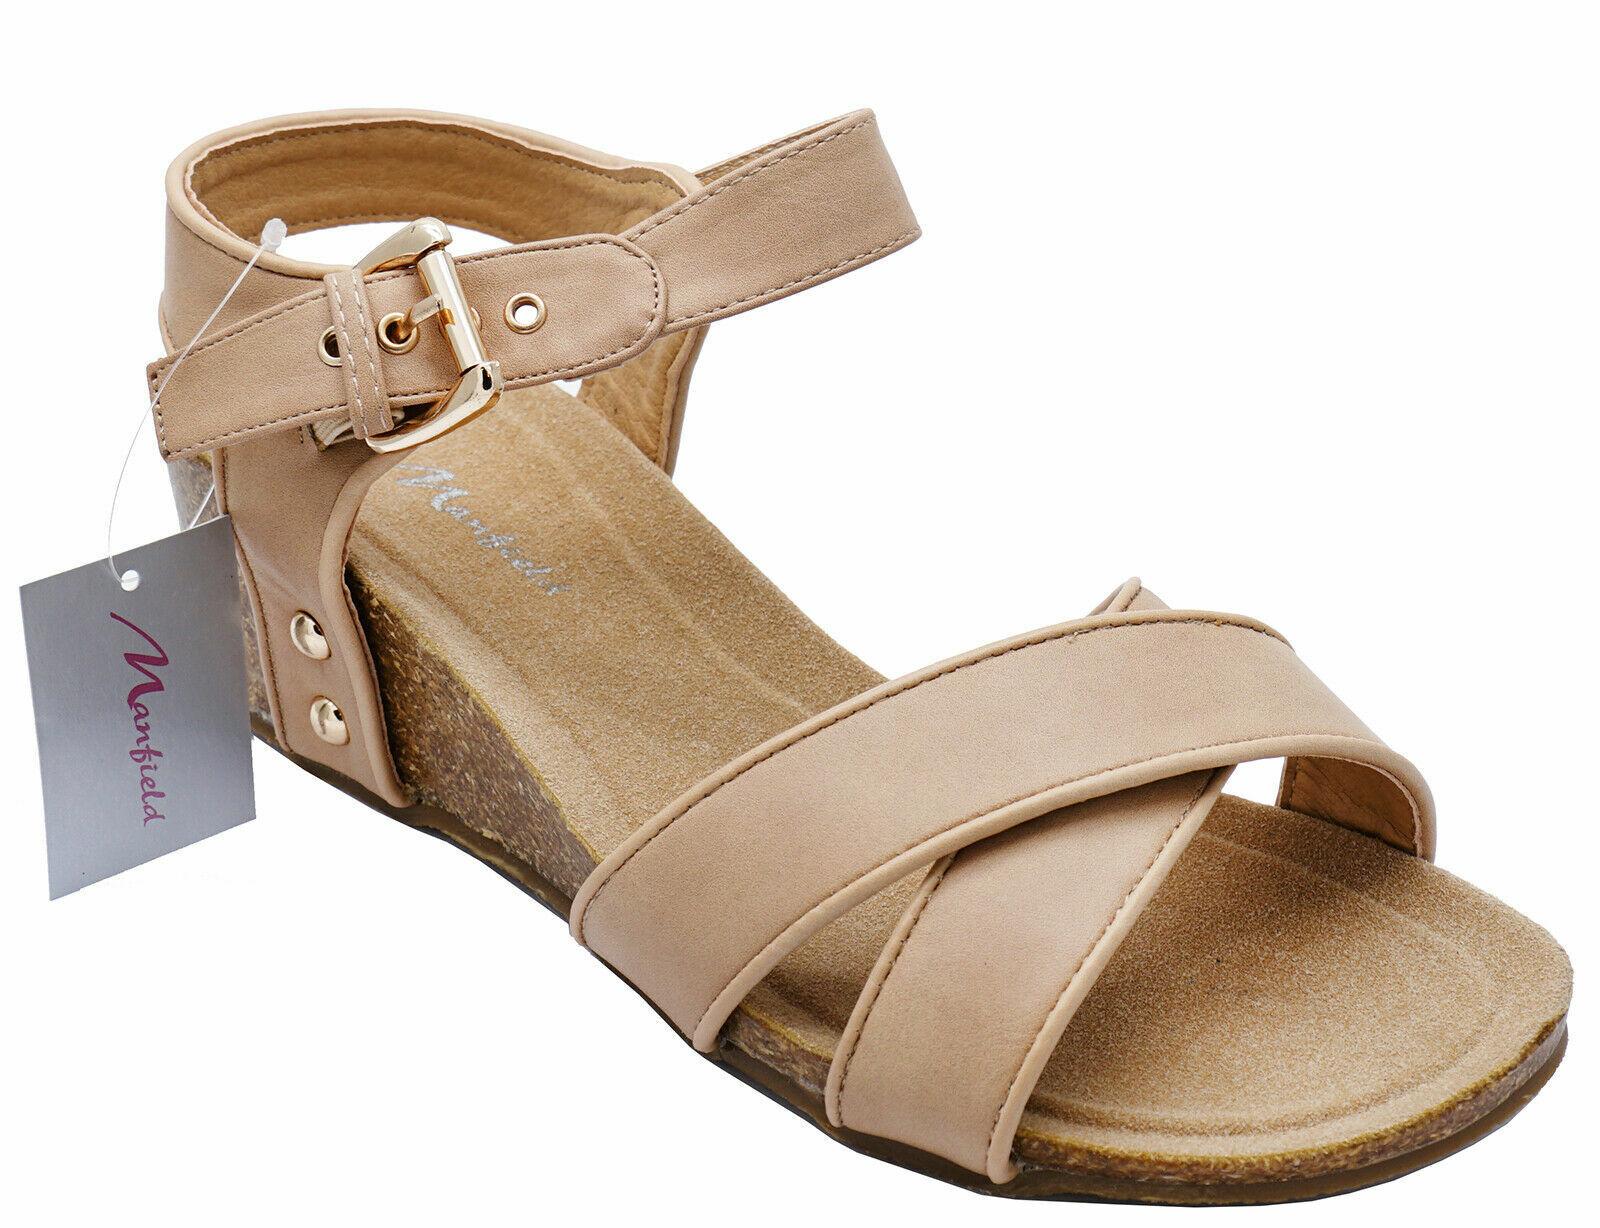 Clarks Originals Phenia Strand Bronze//Brown Suede Womens Shoes Size UK 4D